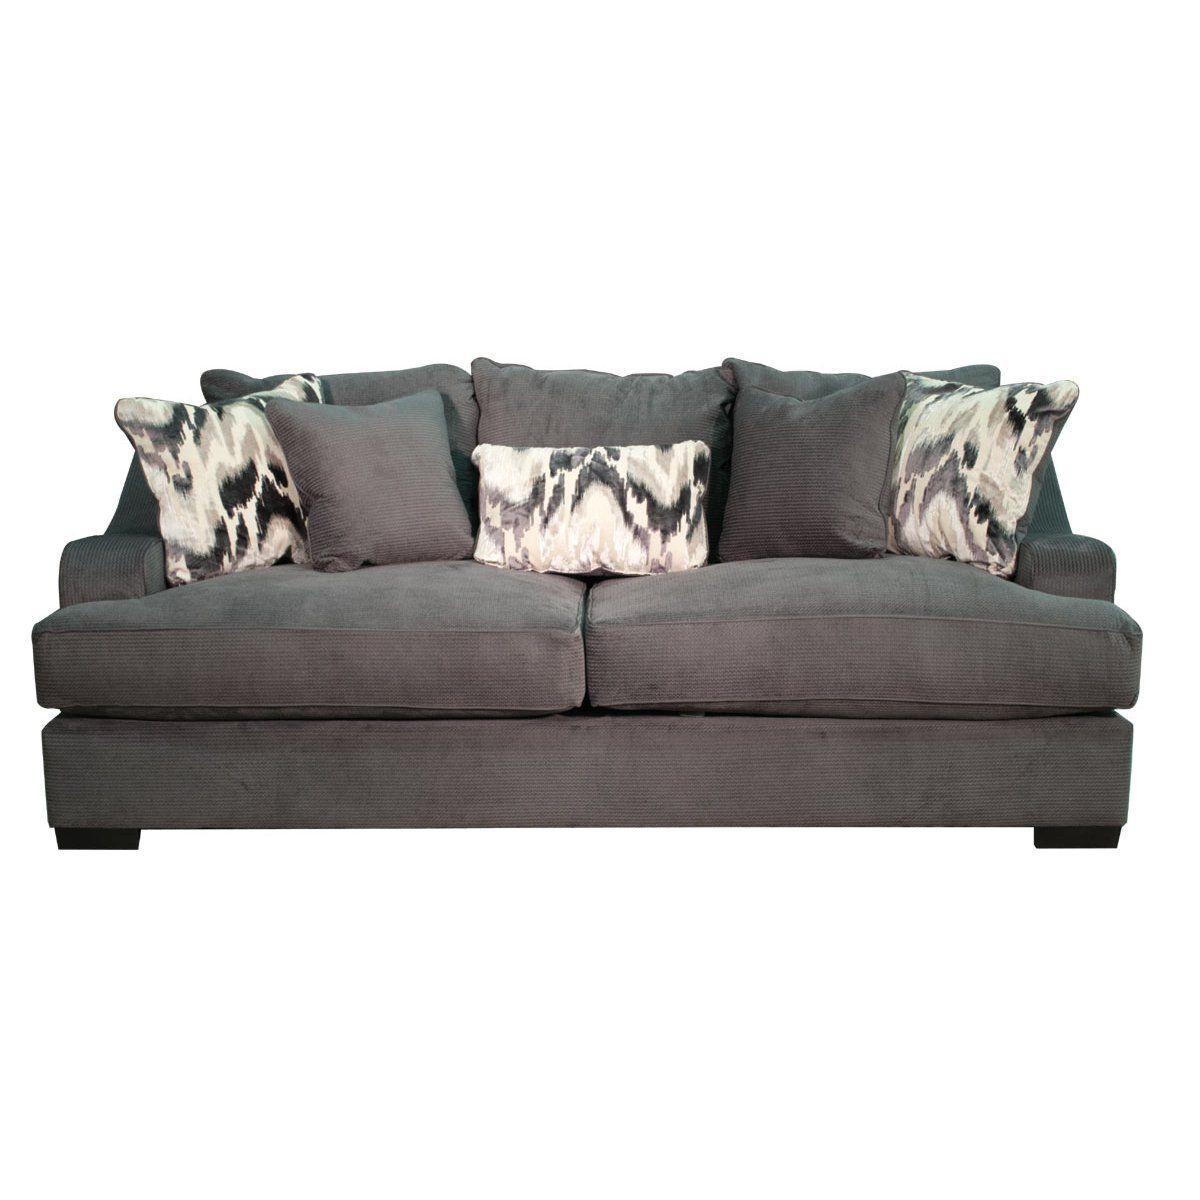 Marvelous Casual Modern Charcoal Gray Sofa Spartan Living Room Beatyapartments Chair Design Images Beatyapartmentscom